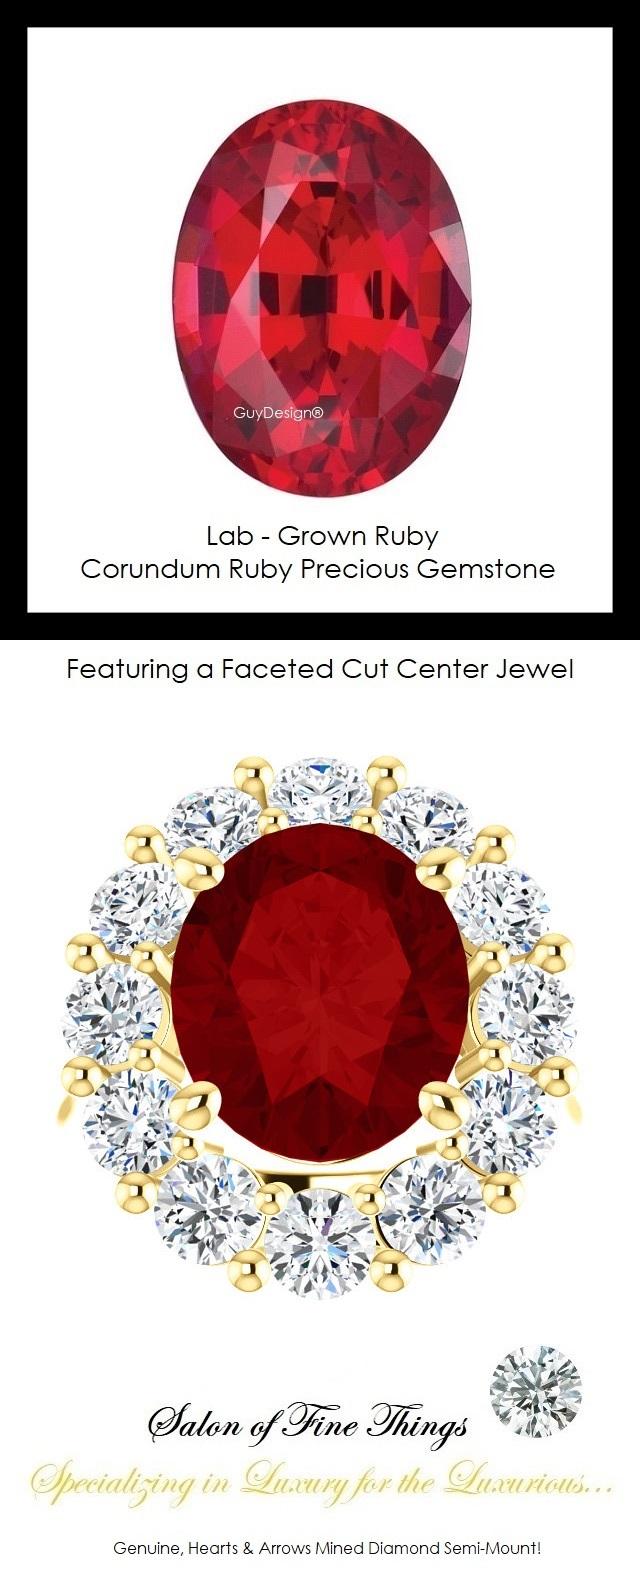 guydesign-opulent-18-karat-yellow-gold-diana-style-ring-dg168175.91020000.71861-6.80-carat-oval-shape-lab-grown-corundum-ruby-set-with-2.40-carats-of-hearts-arrows-3.jpg